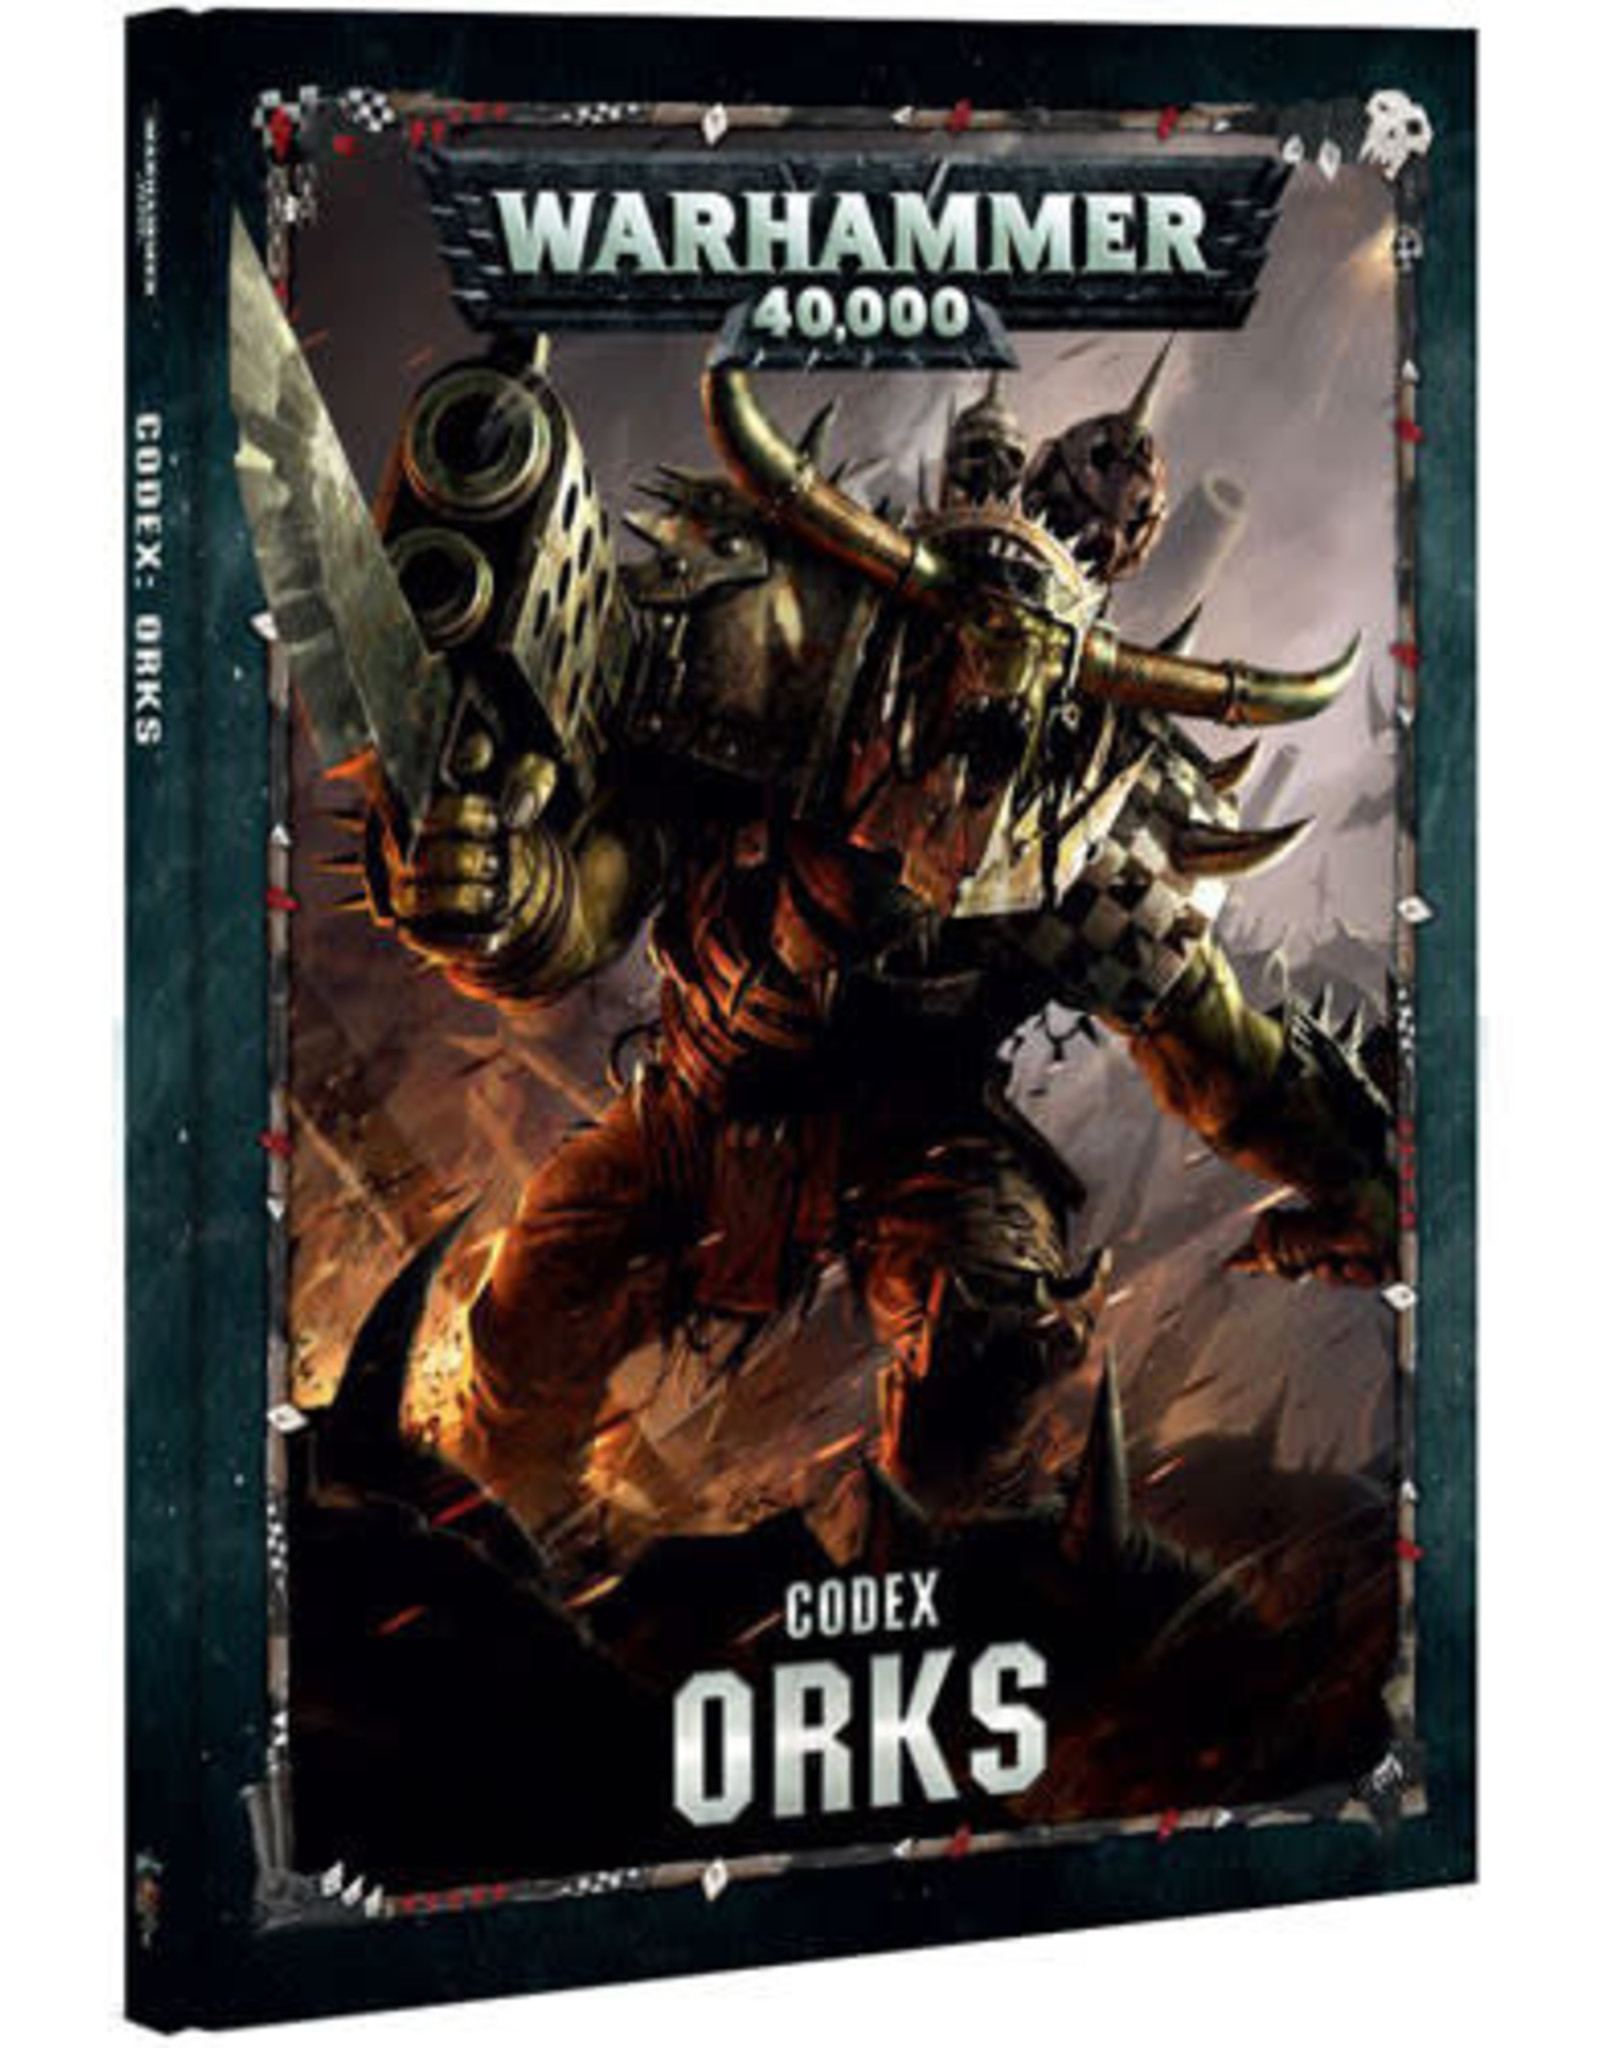 Games Workshop Warhammer 40K: Codex Orks